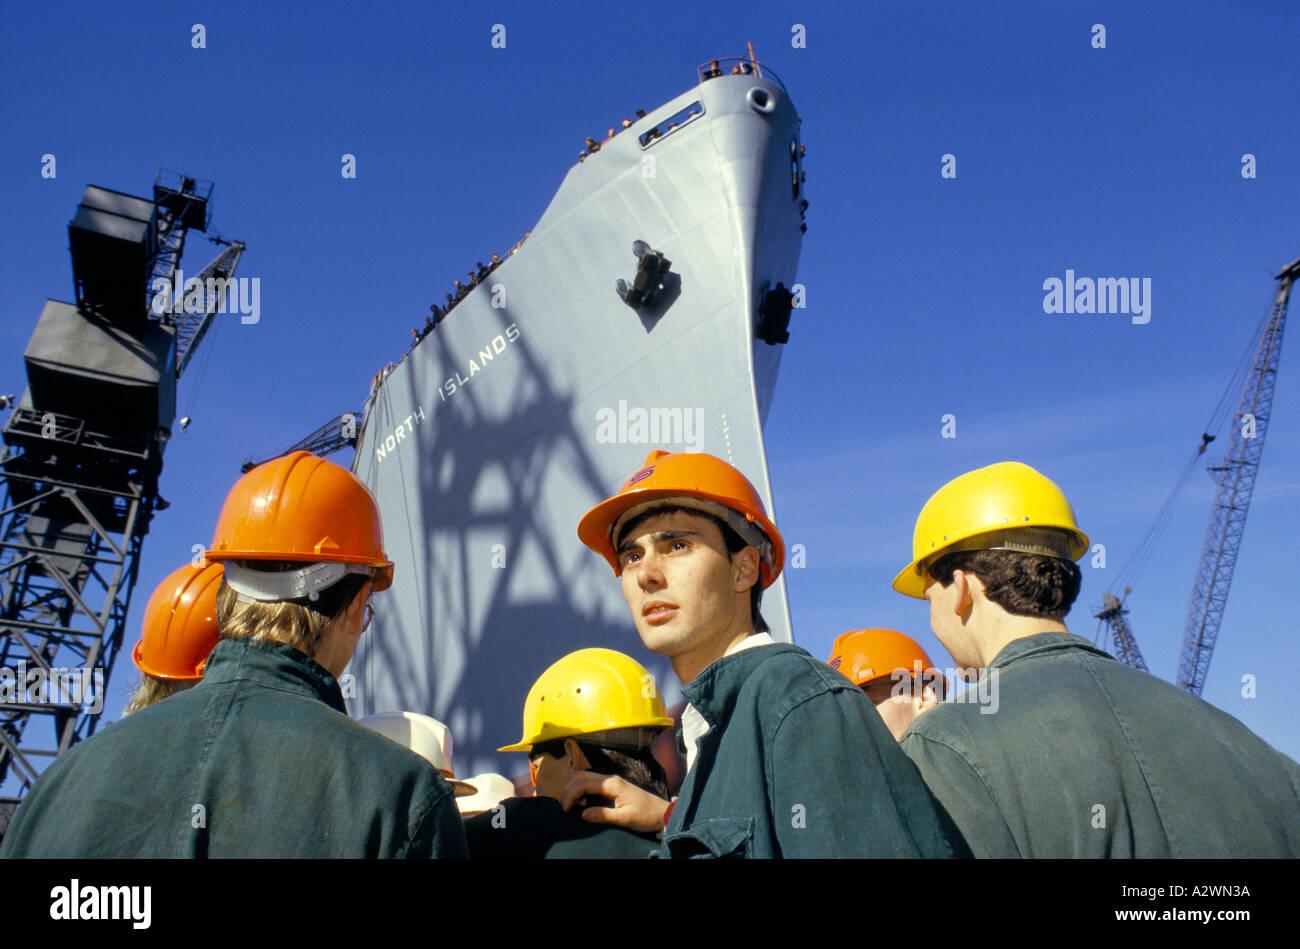 British Steel: British Steel Stock Photos & British Steel Stock Images